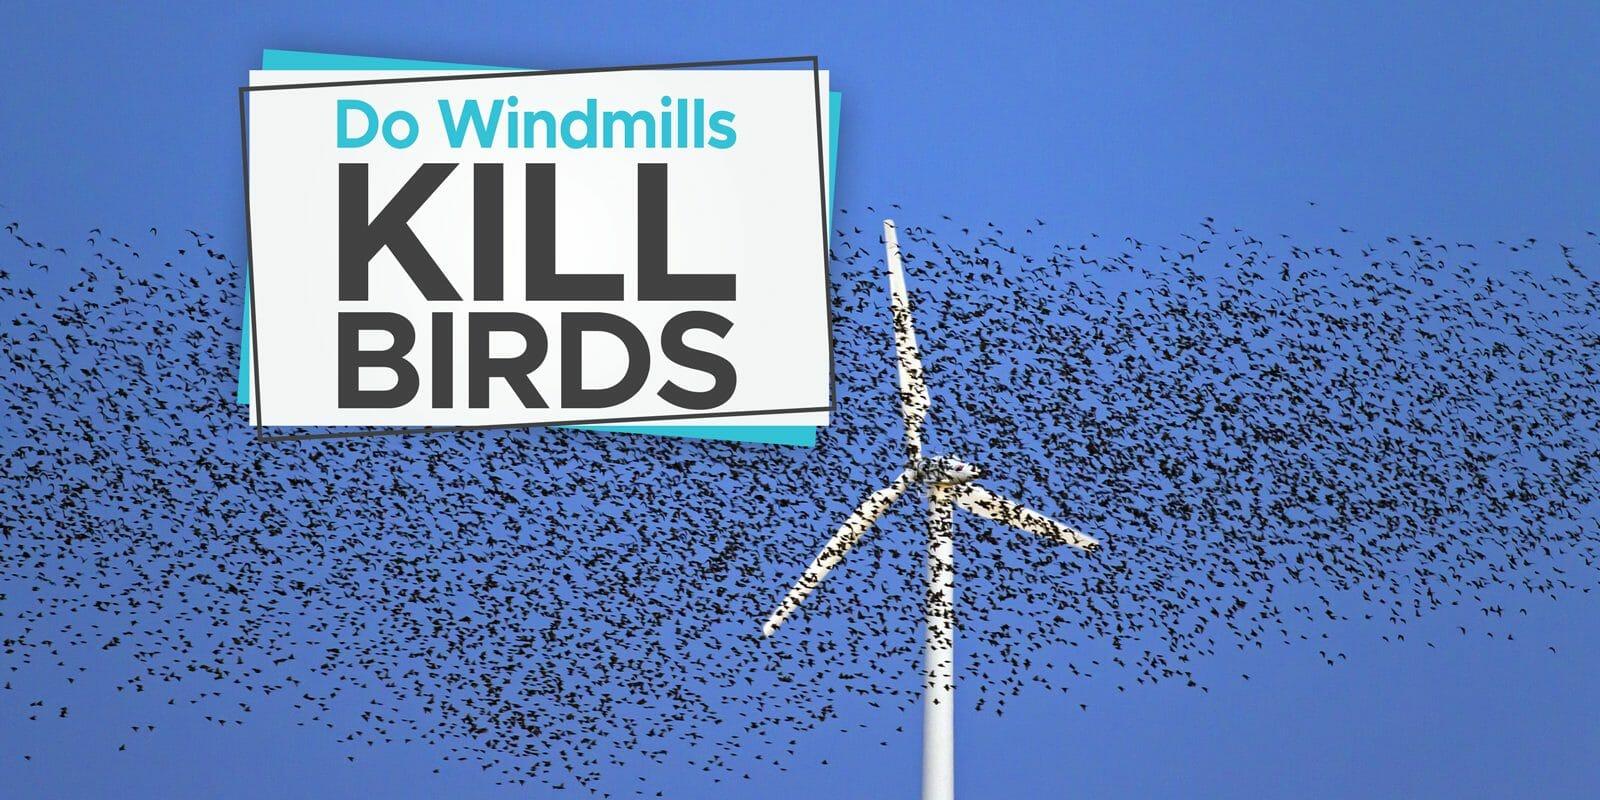 do windmills kill birds